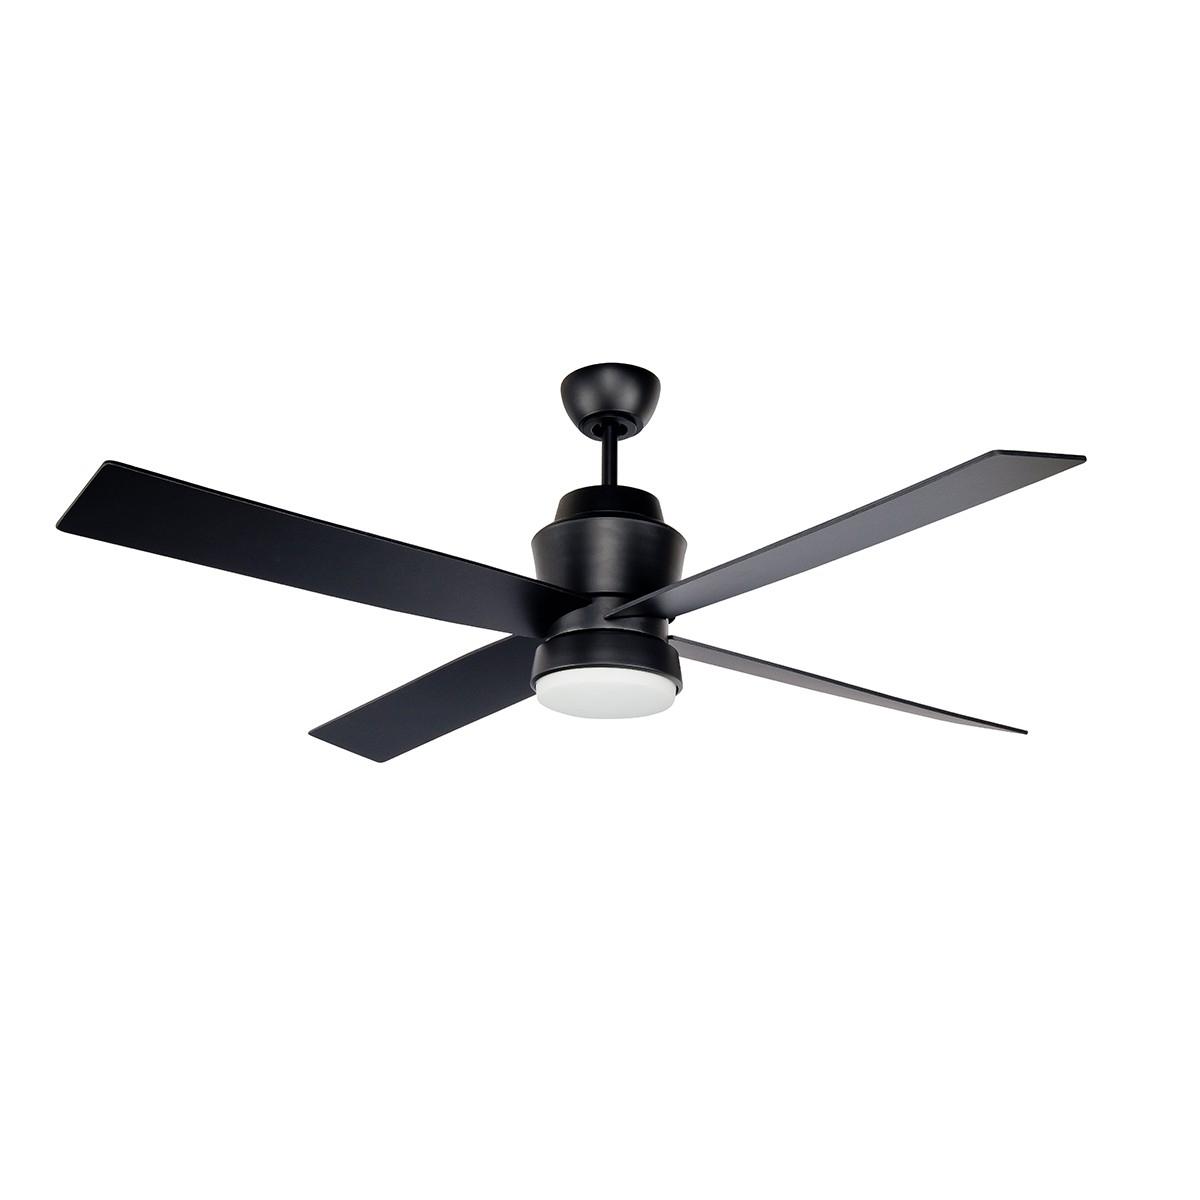 Popular Modern Outdoor Ceiling Fans With Lights Regarding Prologue Outdoor Ceiling Fan :: Stori Modern (View 13 of 20)